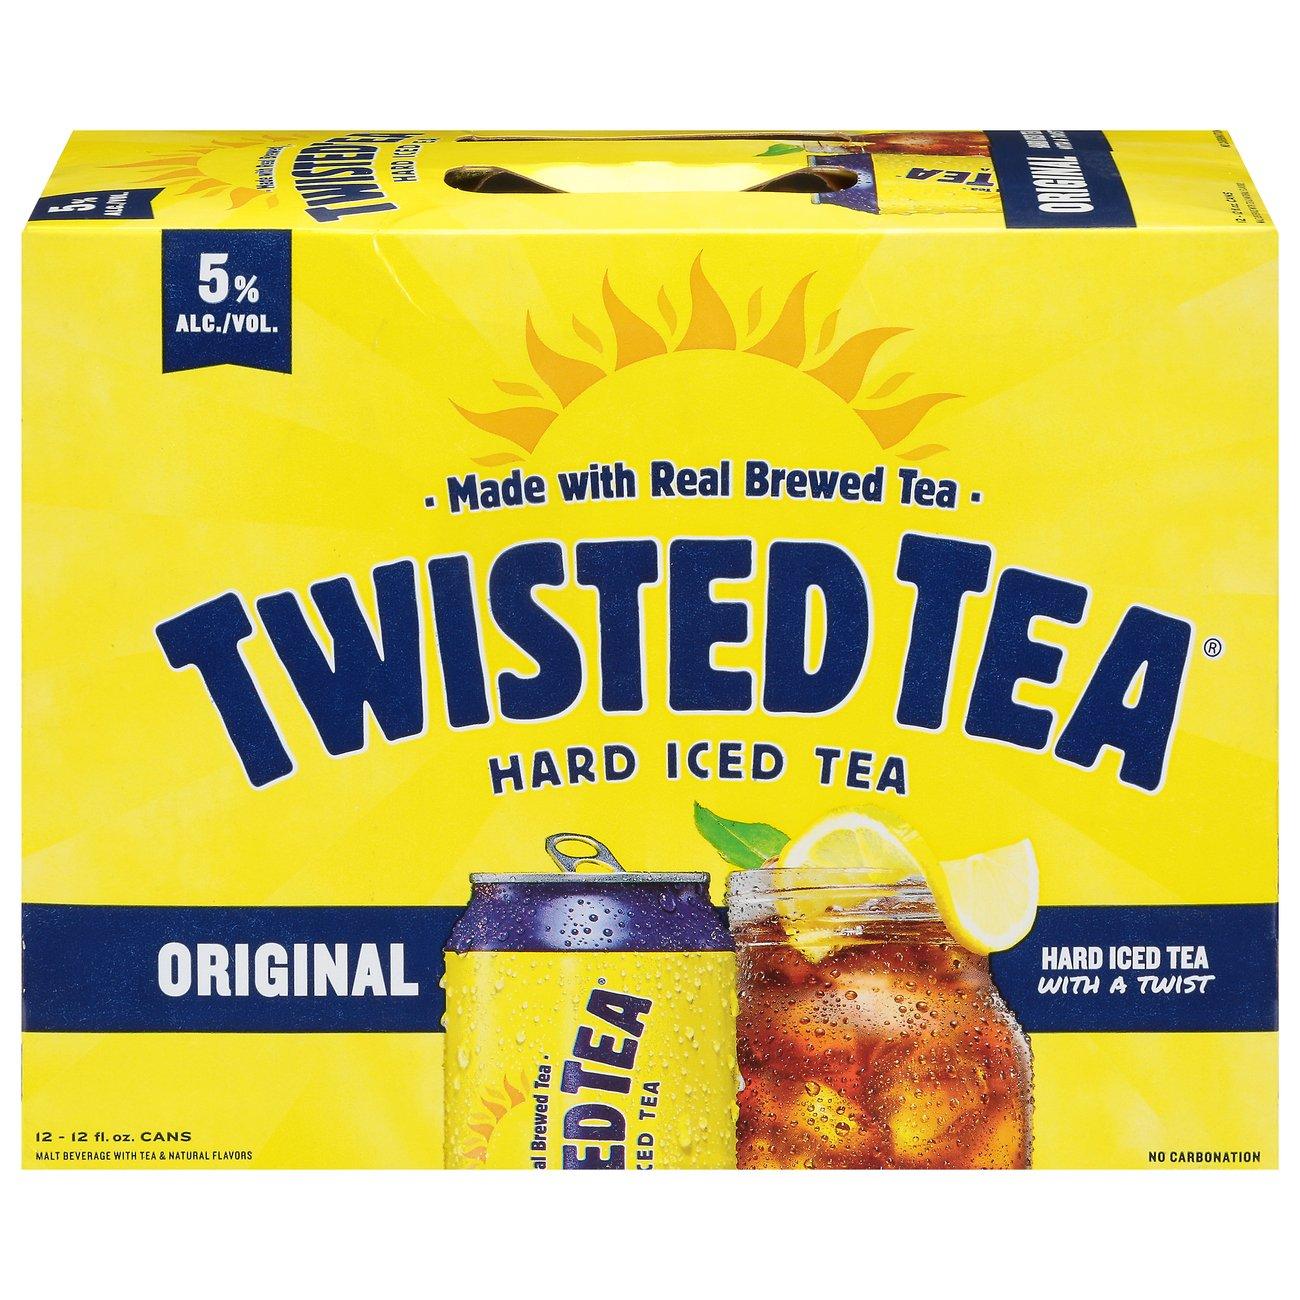 Twisted Tea Hard Iced Tea 12 oz Cans ‑ Shop Malt Beverages & Coolers at  H‑E‑B